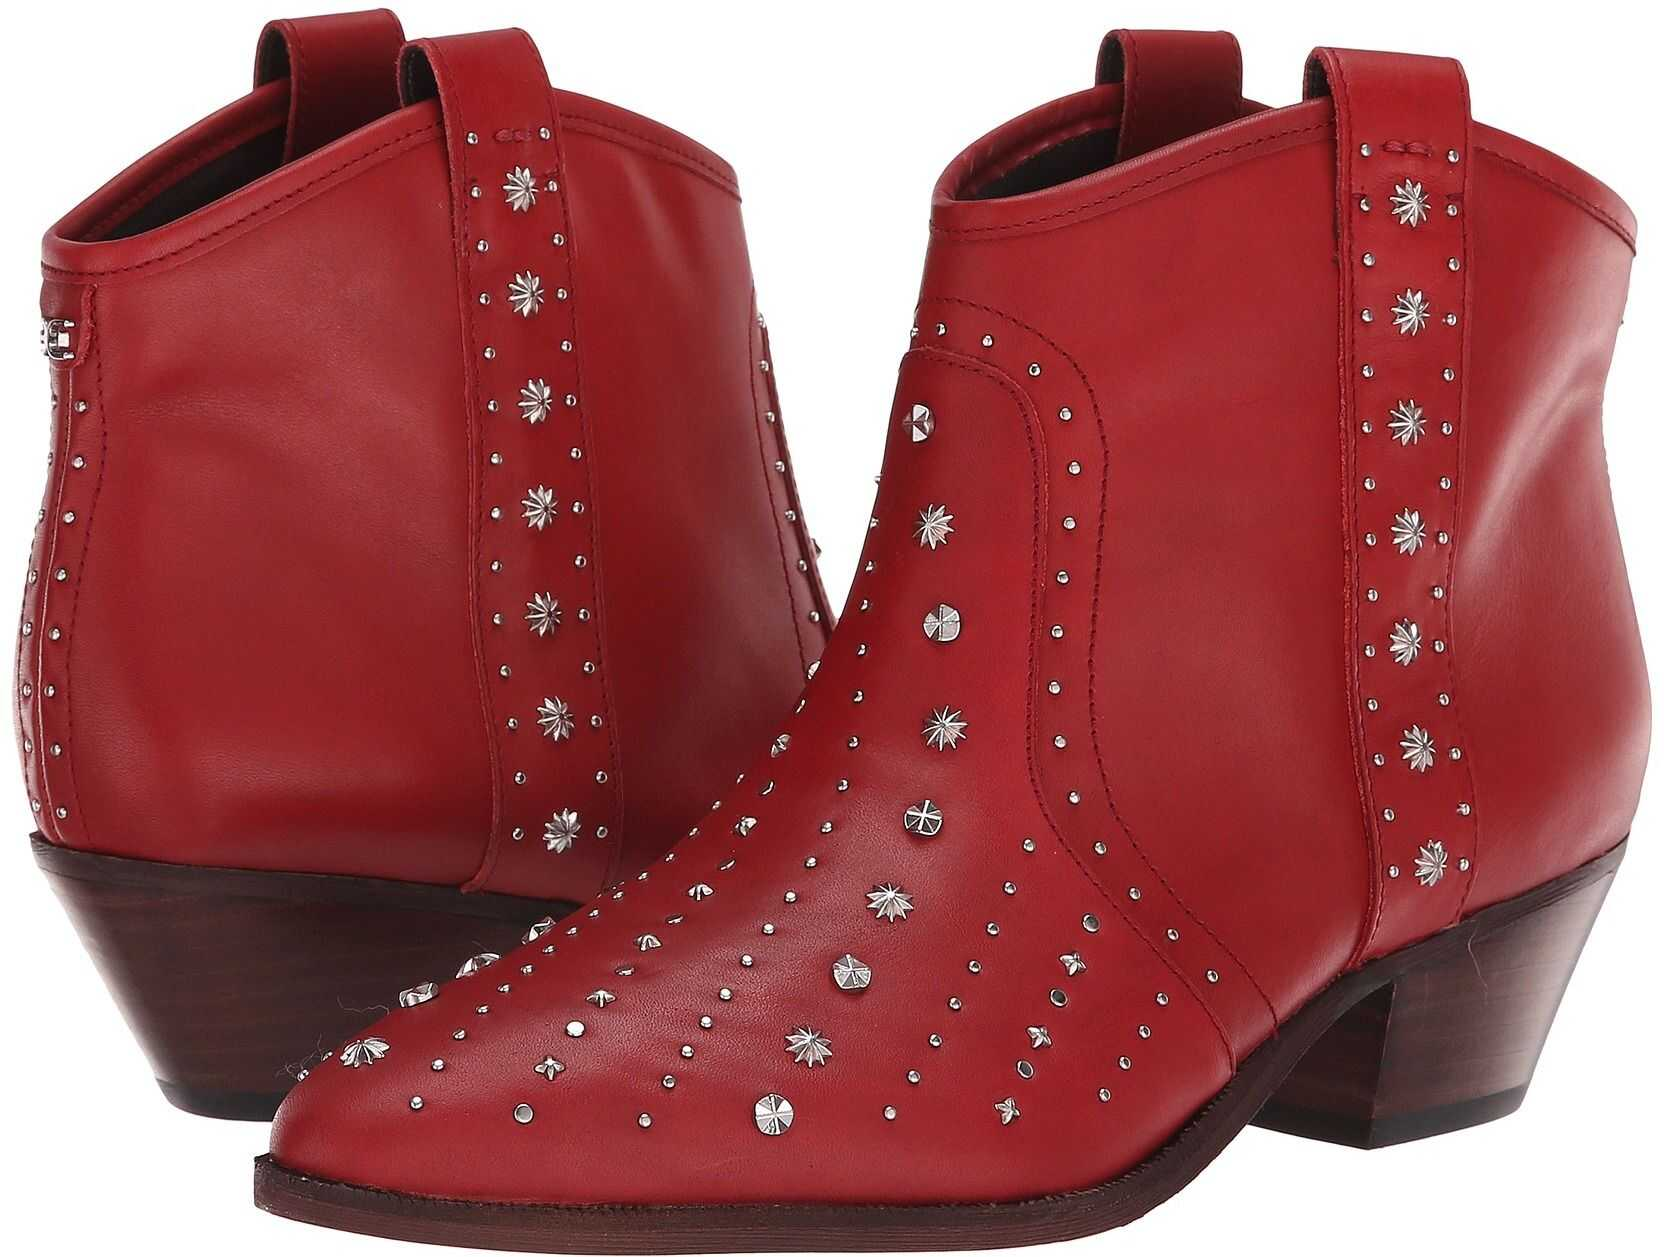 Sam Edelman Brian Deep Red Sequins Bally Leather